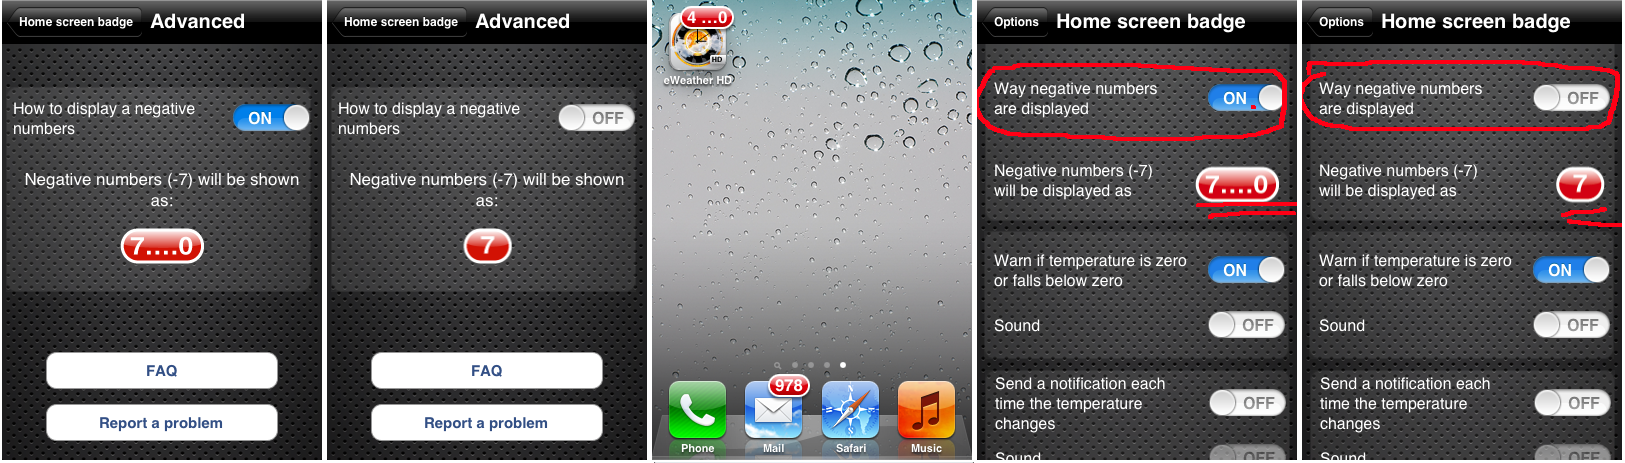 eWeather hd weather app iphone,ipad,ipod hi-def radar, satellite, weather alerts, earthquakes, beach water, sea surface - neg1